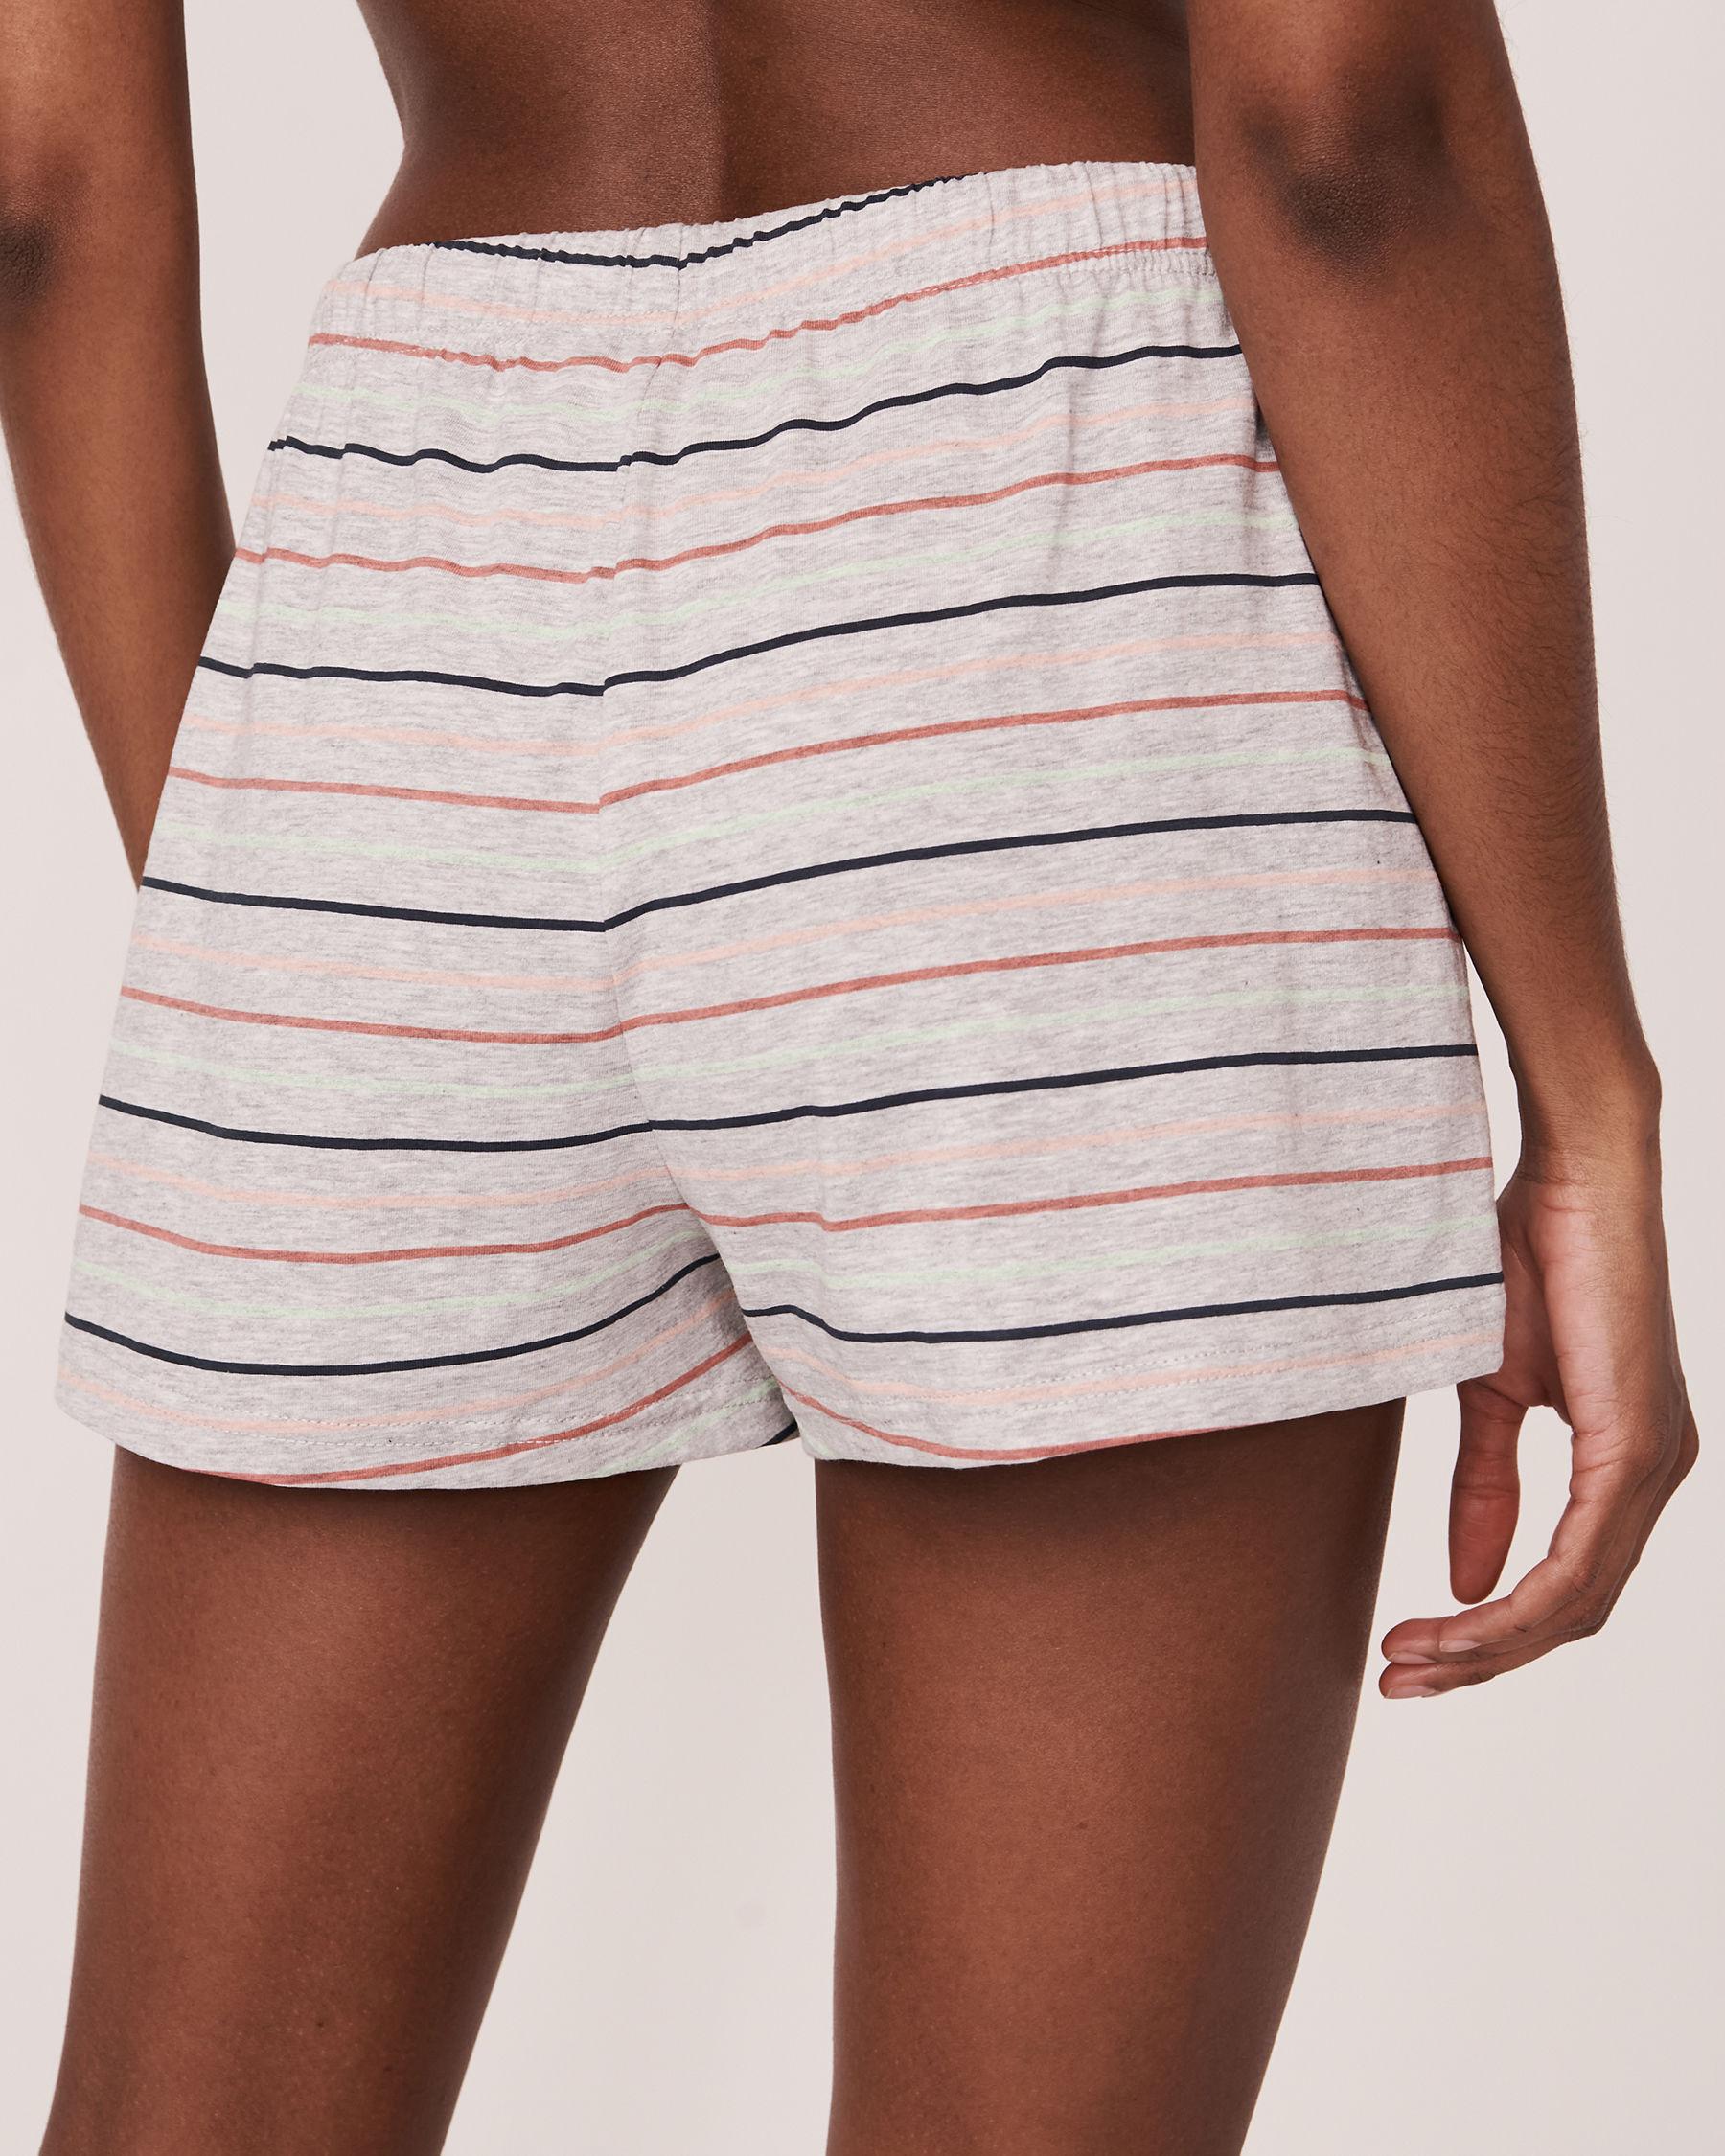 LA VIE EN ROSE Pyjama Short with Drawstring Multi stripe mix 40200107 - View2